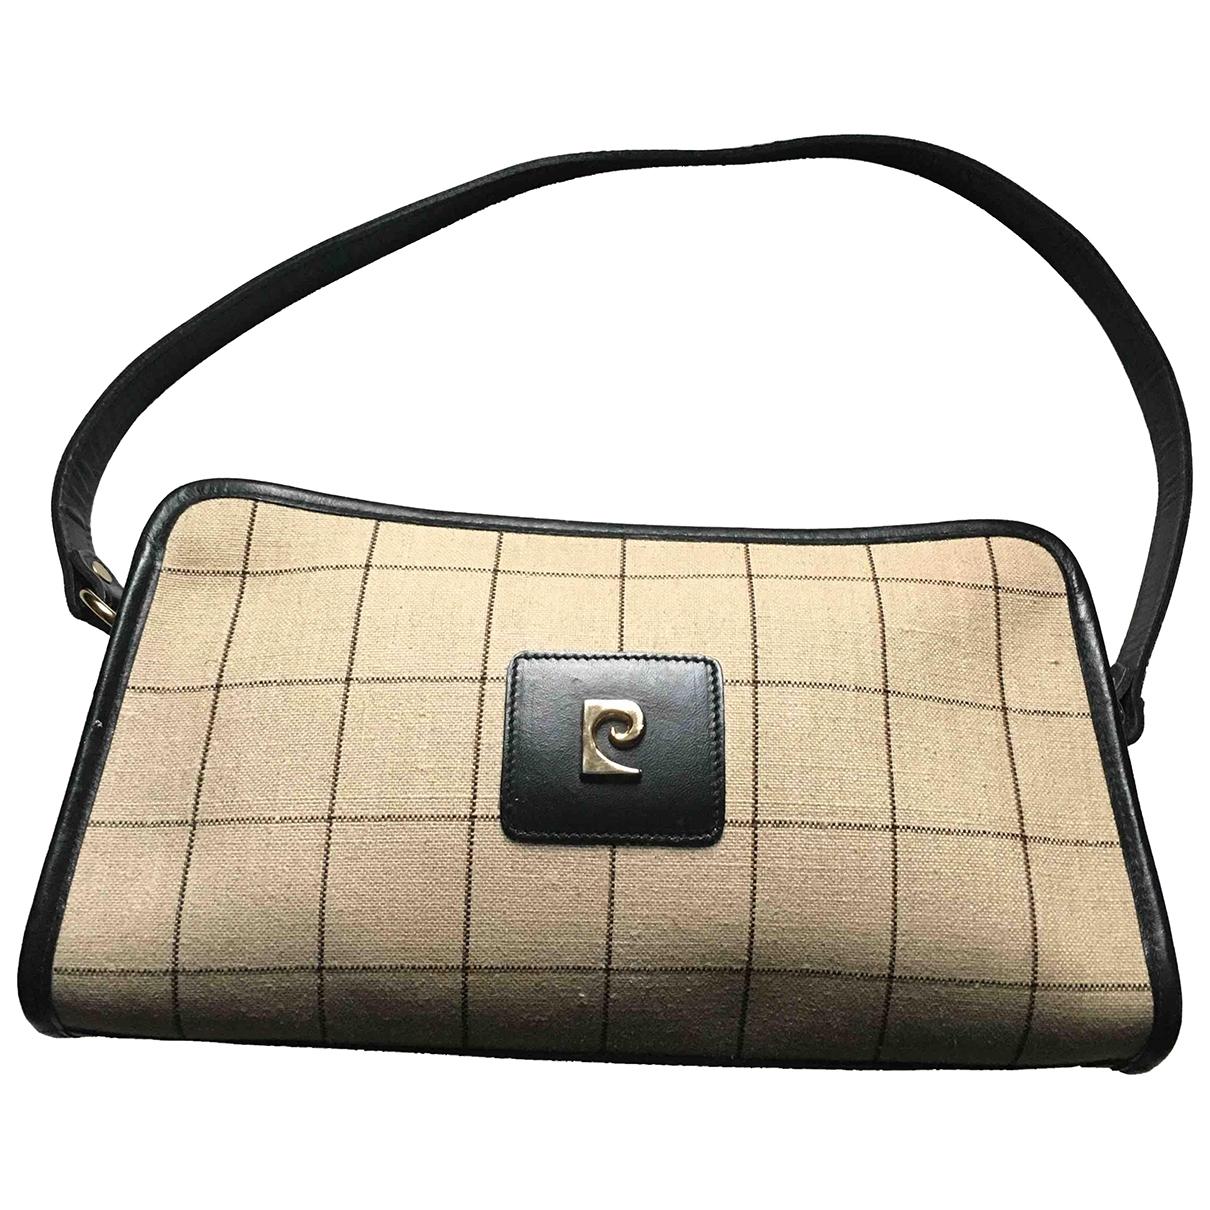 Pierre Cardin \N Multicolour Cloth handbag for Women \N